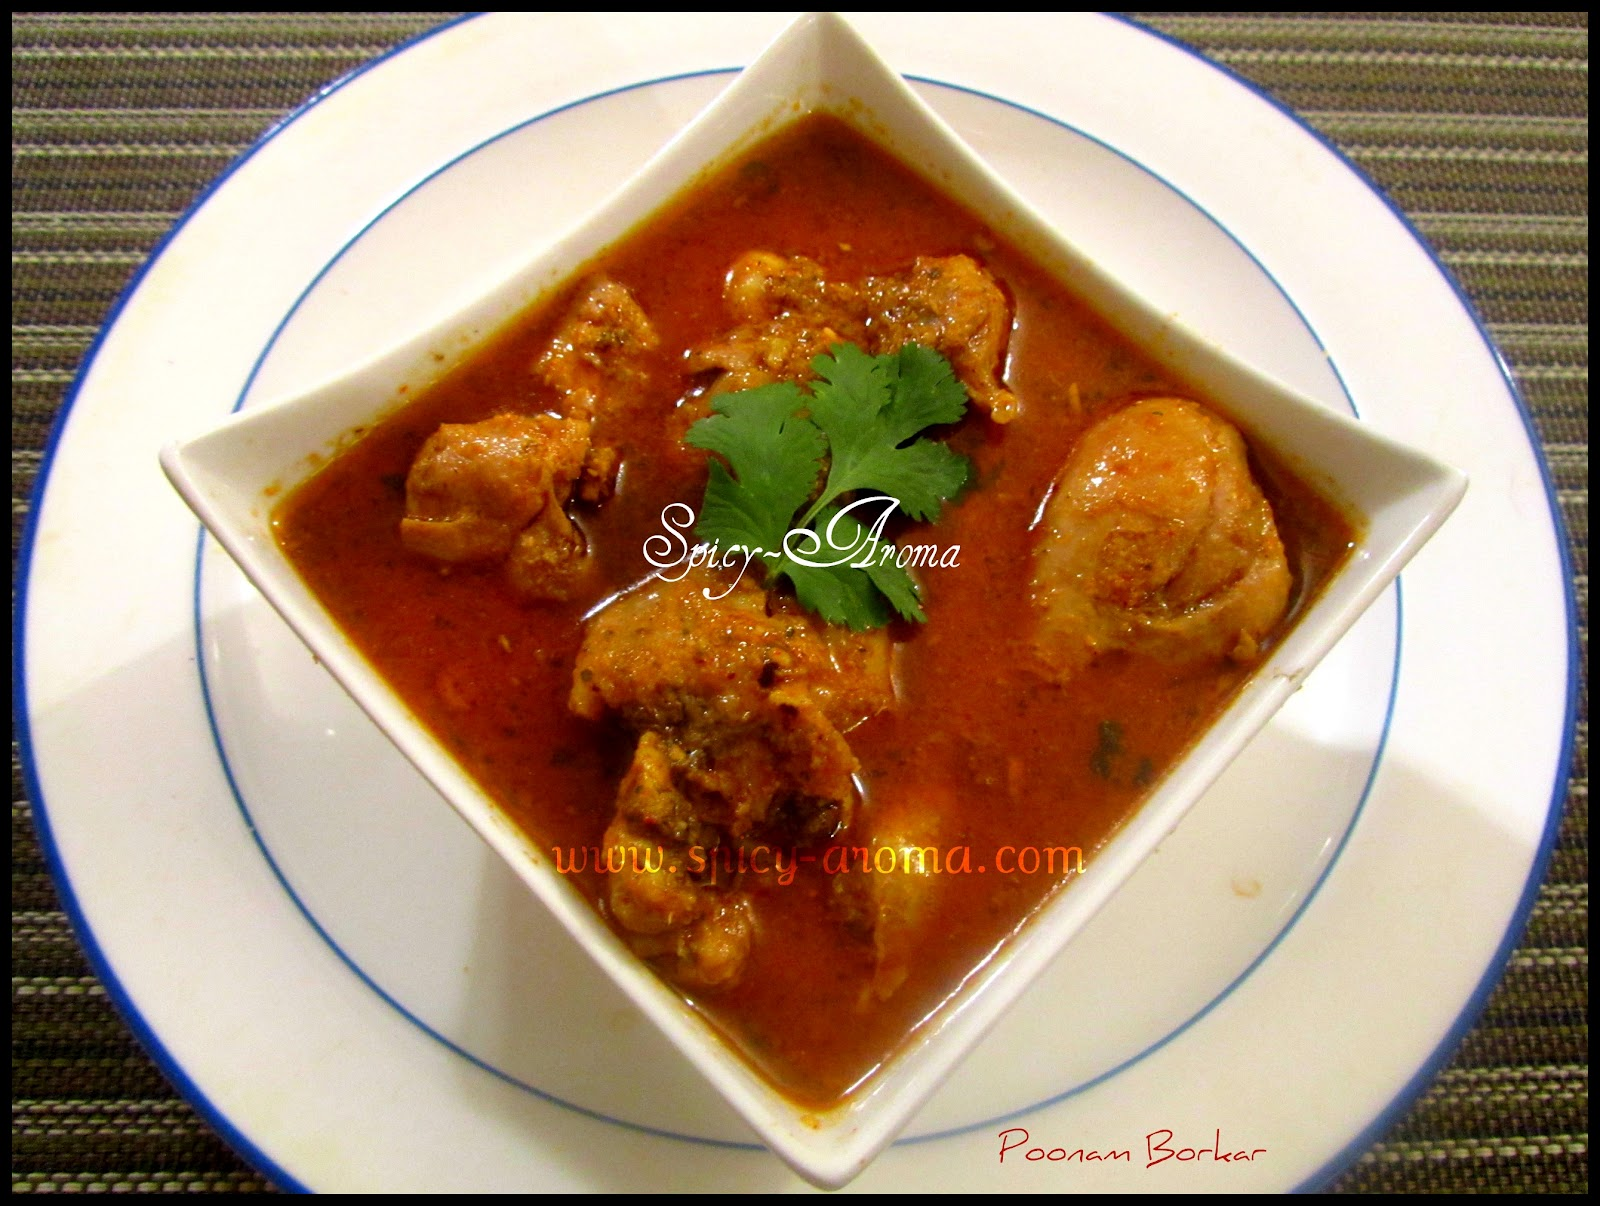 Kombdi rassa spicy chicken curry maharashtrian style spicy aroma kombdi rassa spicy chicken curry maharashtrian style forumfinder Image collections